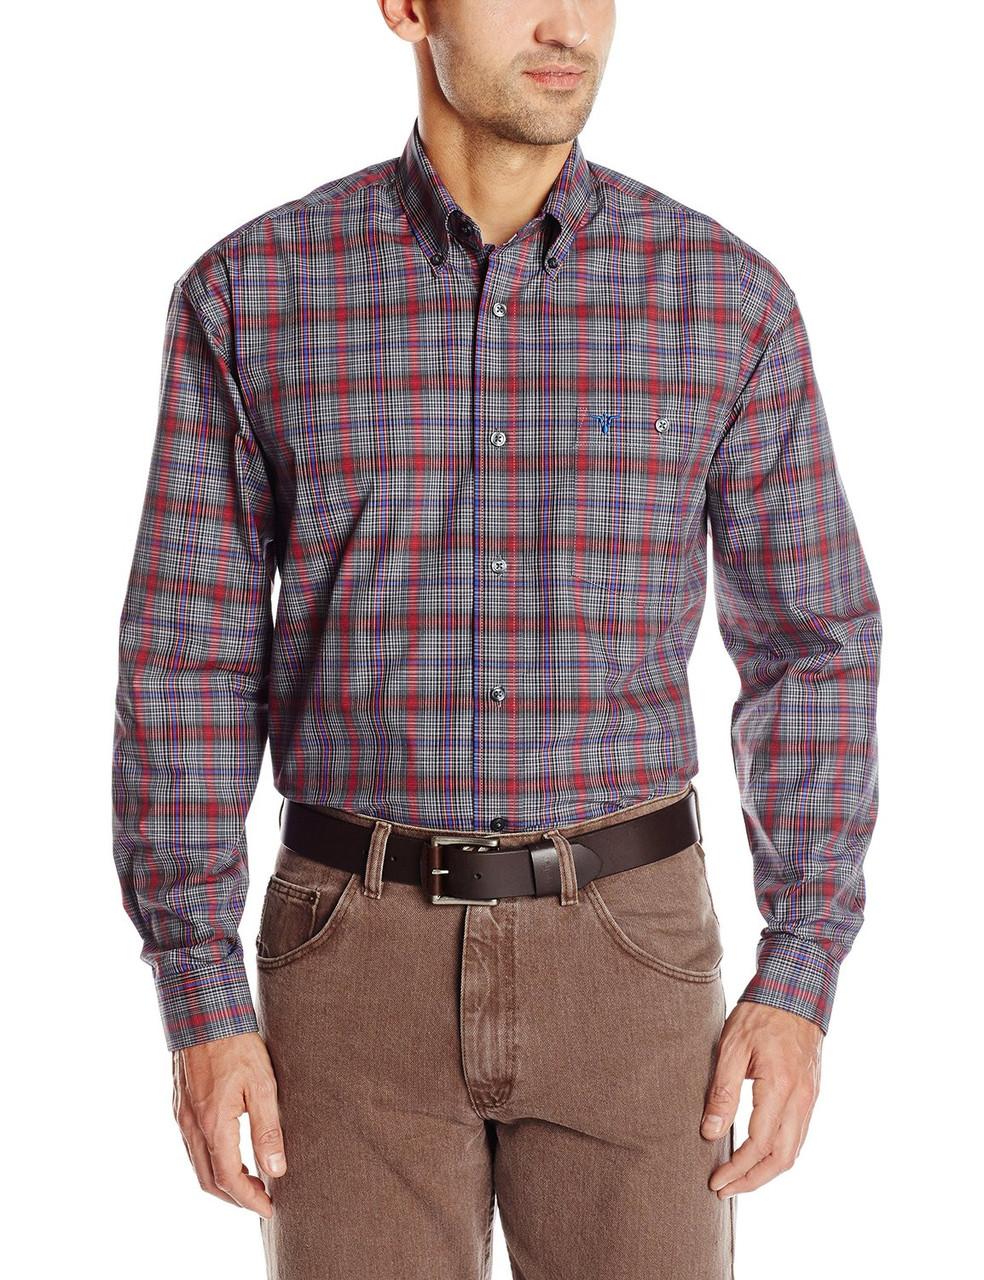 Рубашка Wrangler 20X, M, Red/Black/Blue, MJ2604M